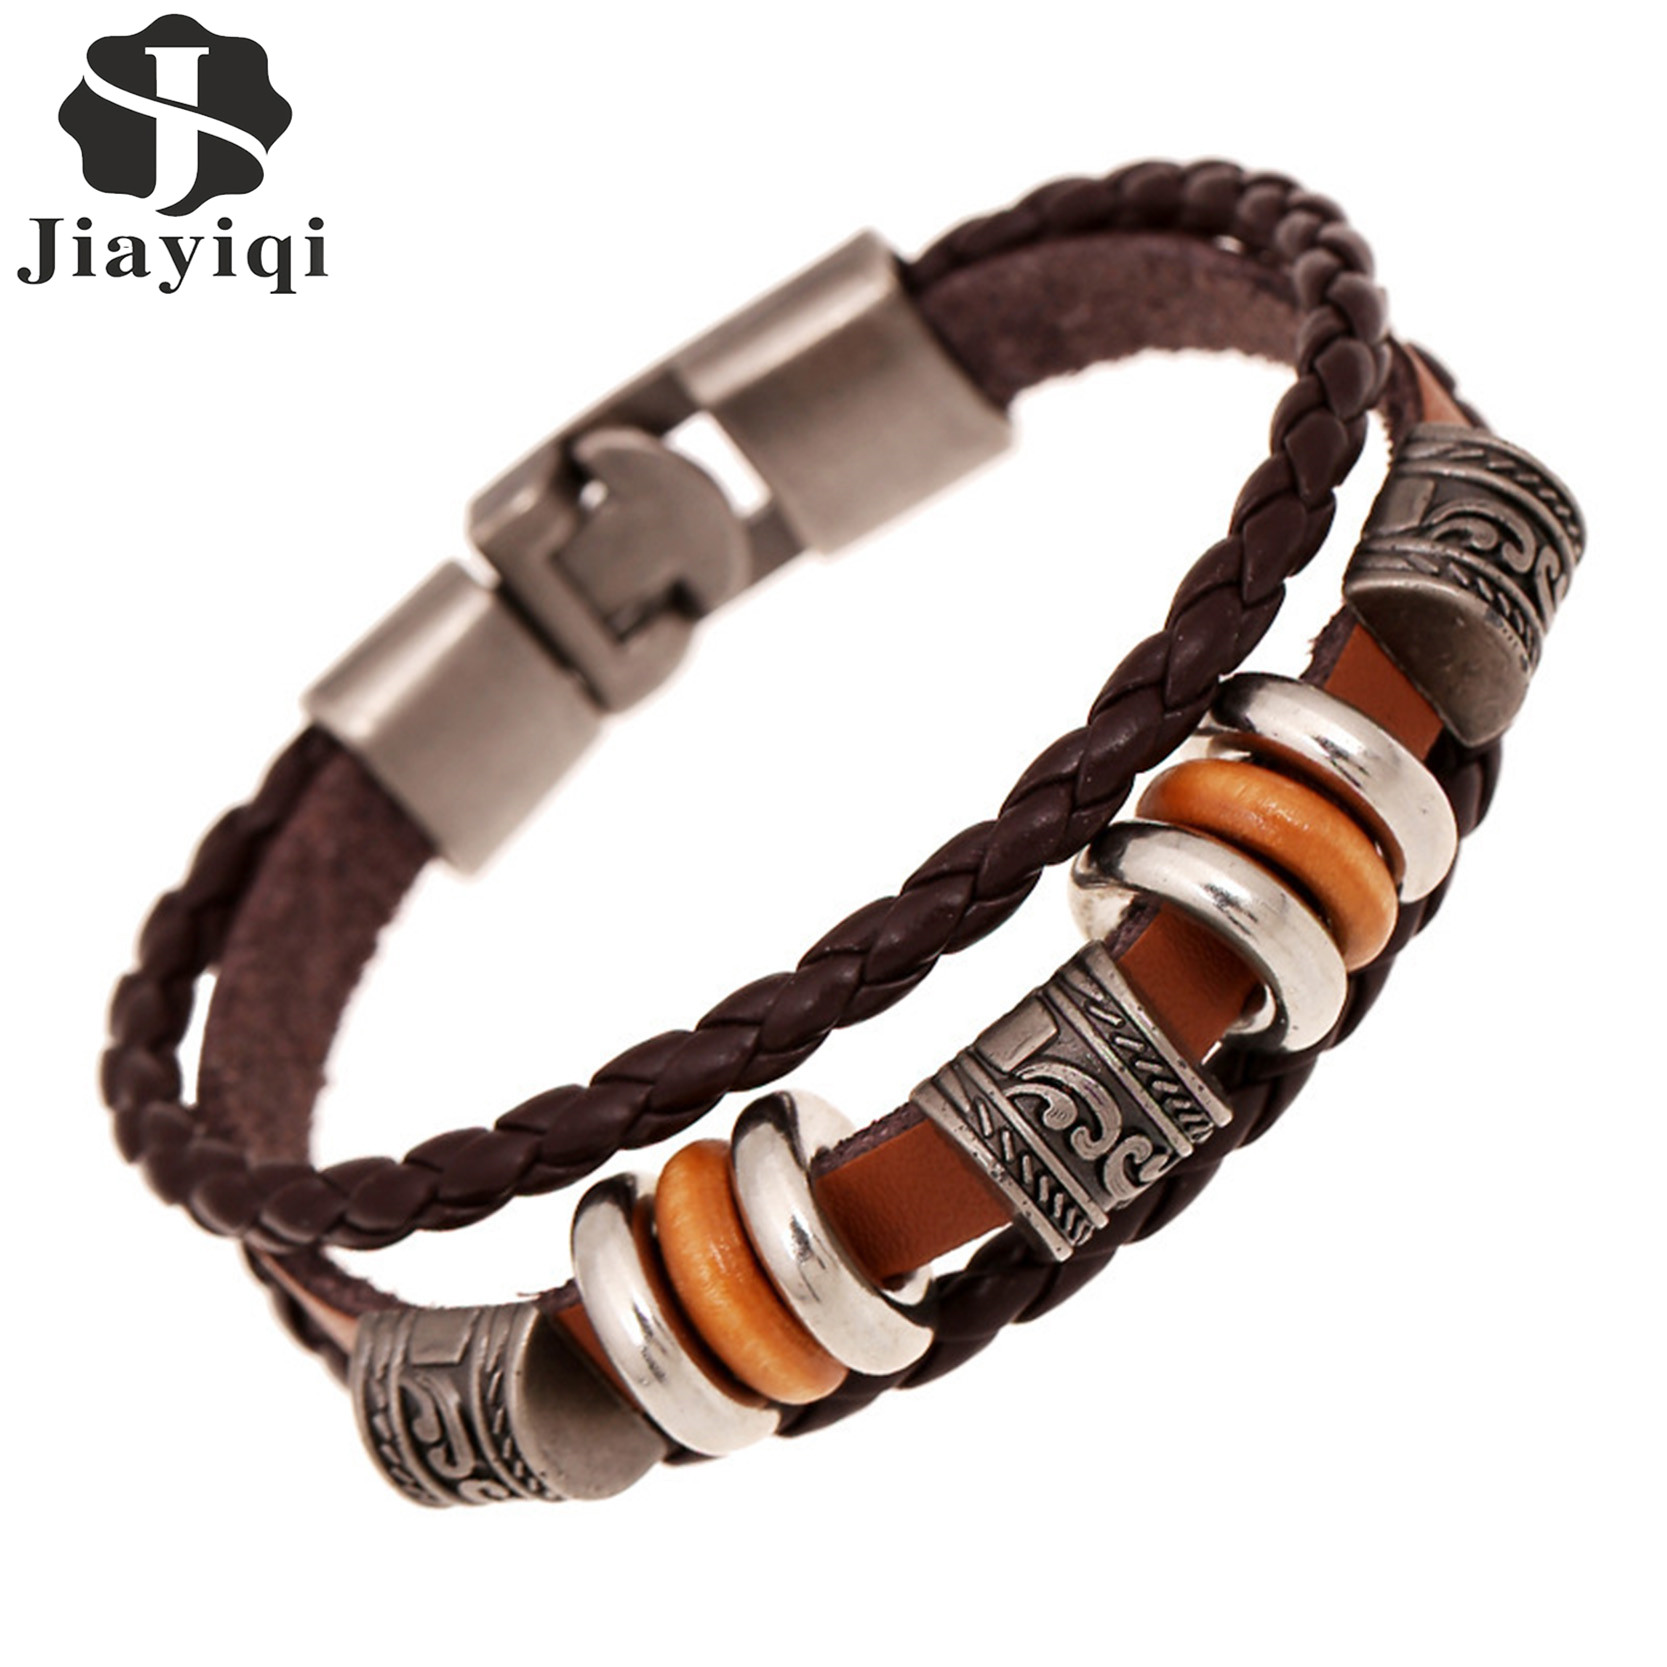 Jiayiqi Vintage Beads Bracelet Handmade Woven Elegant ...